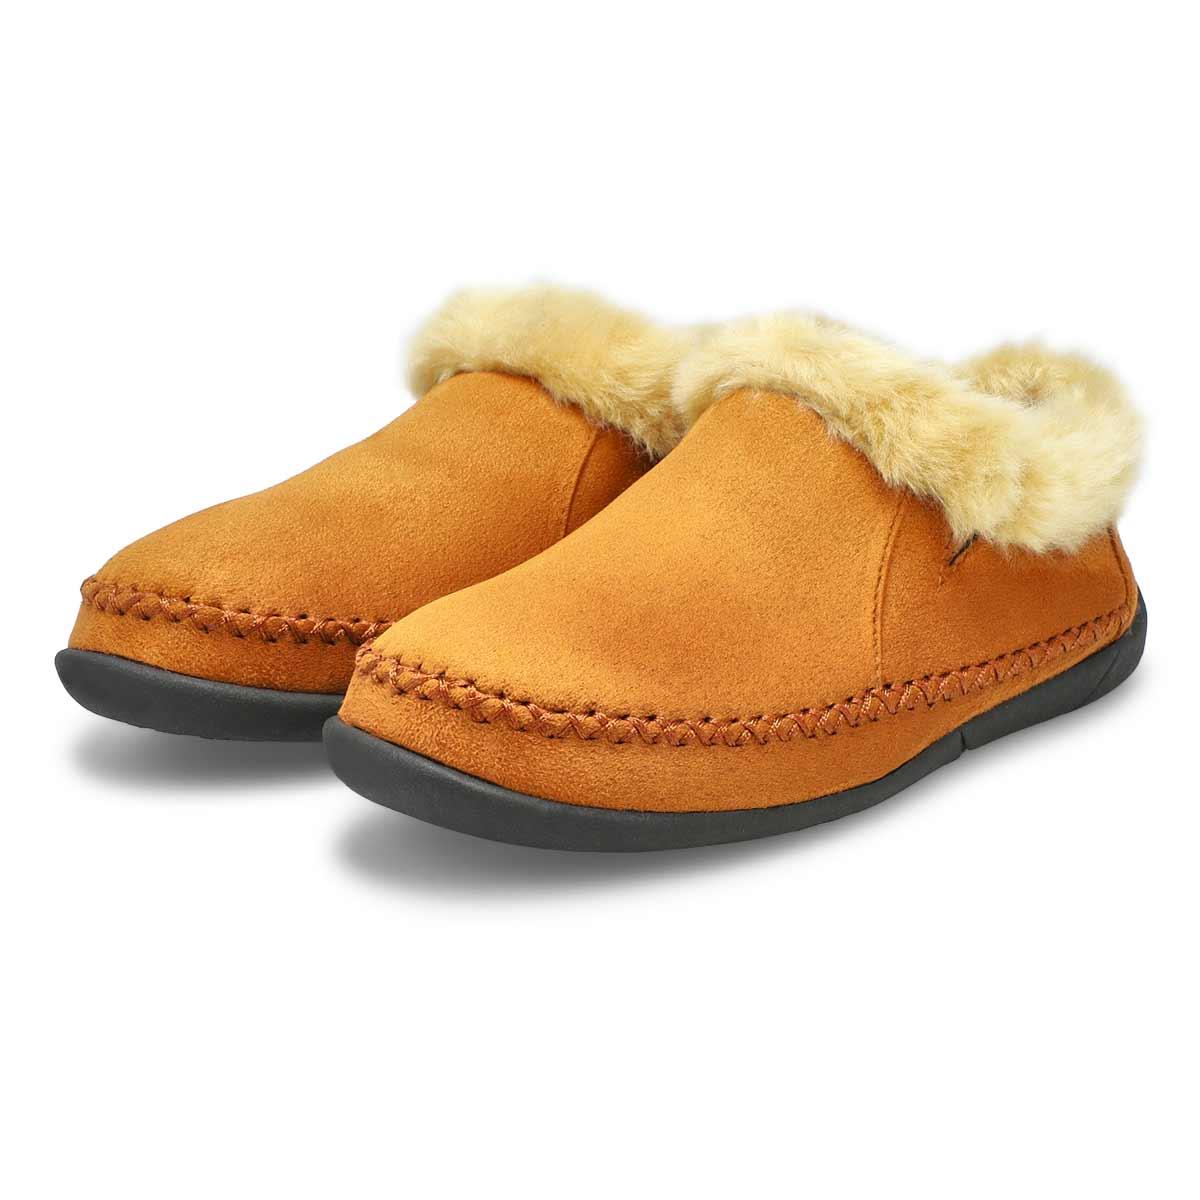 Lds Shae camel slip on bootie